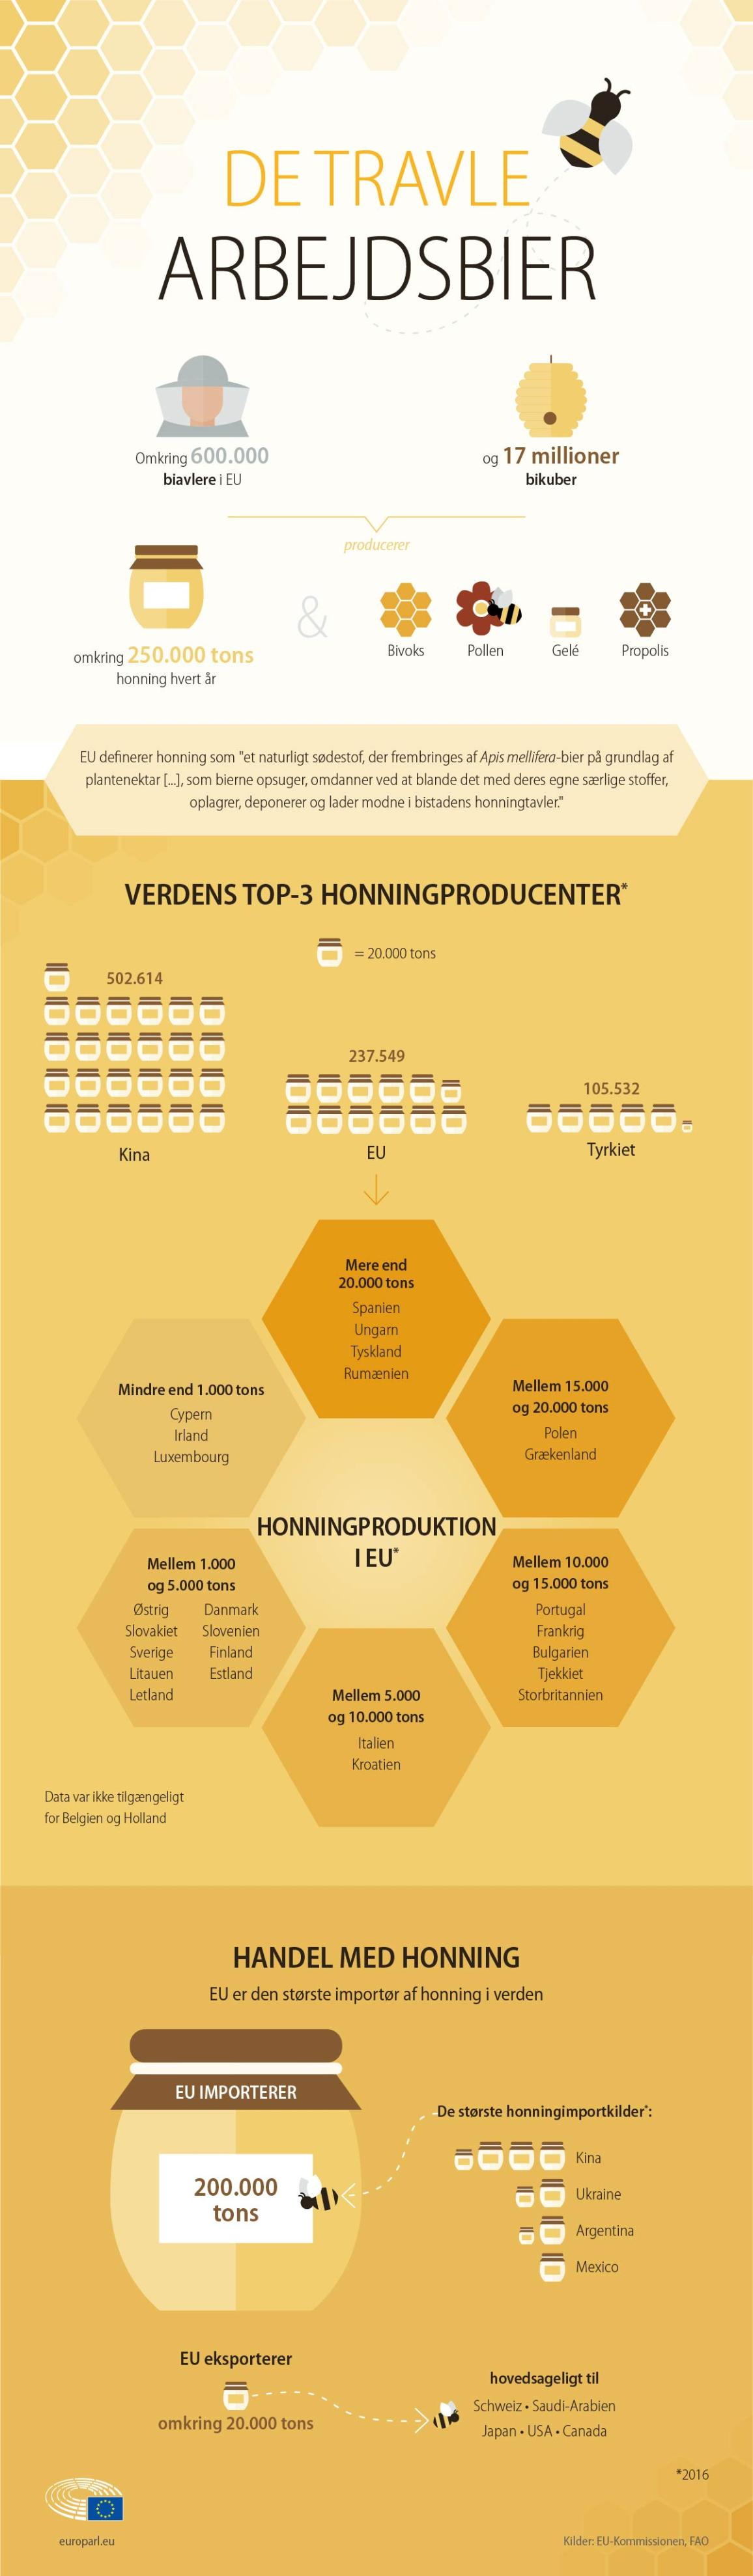 Infografik over honningmarkedet i EU.